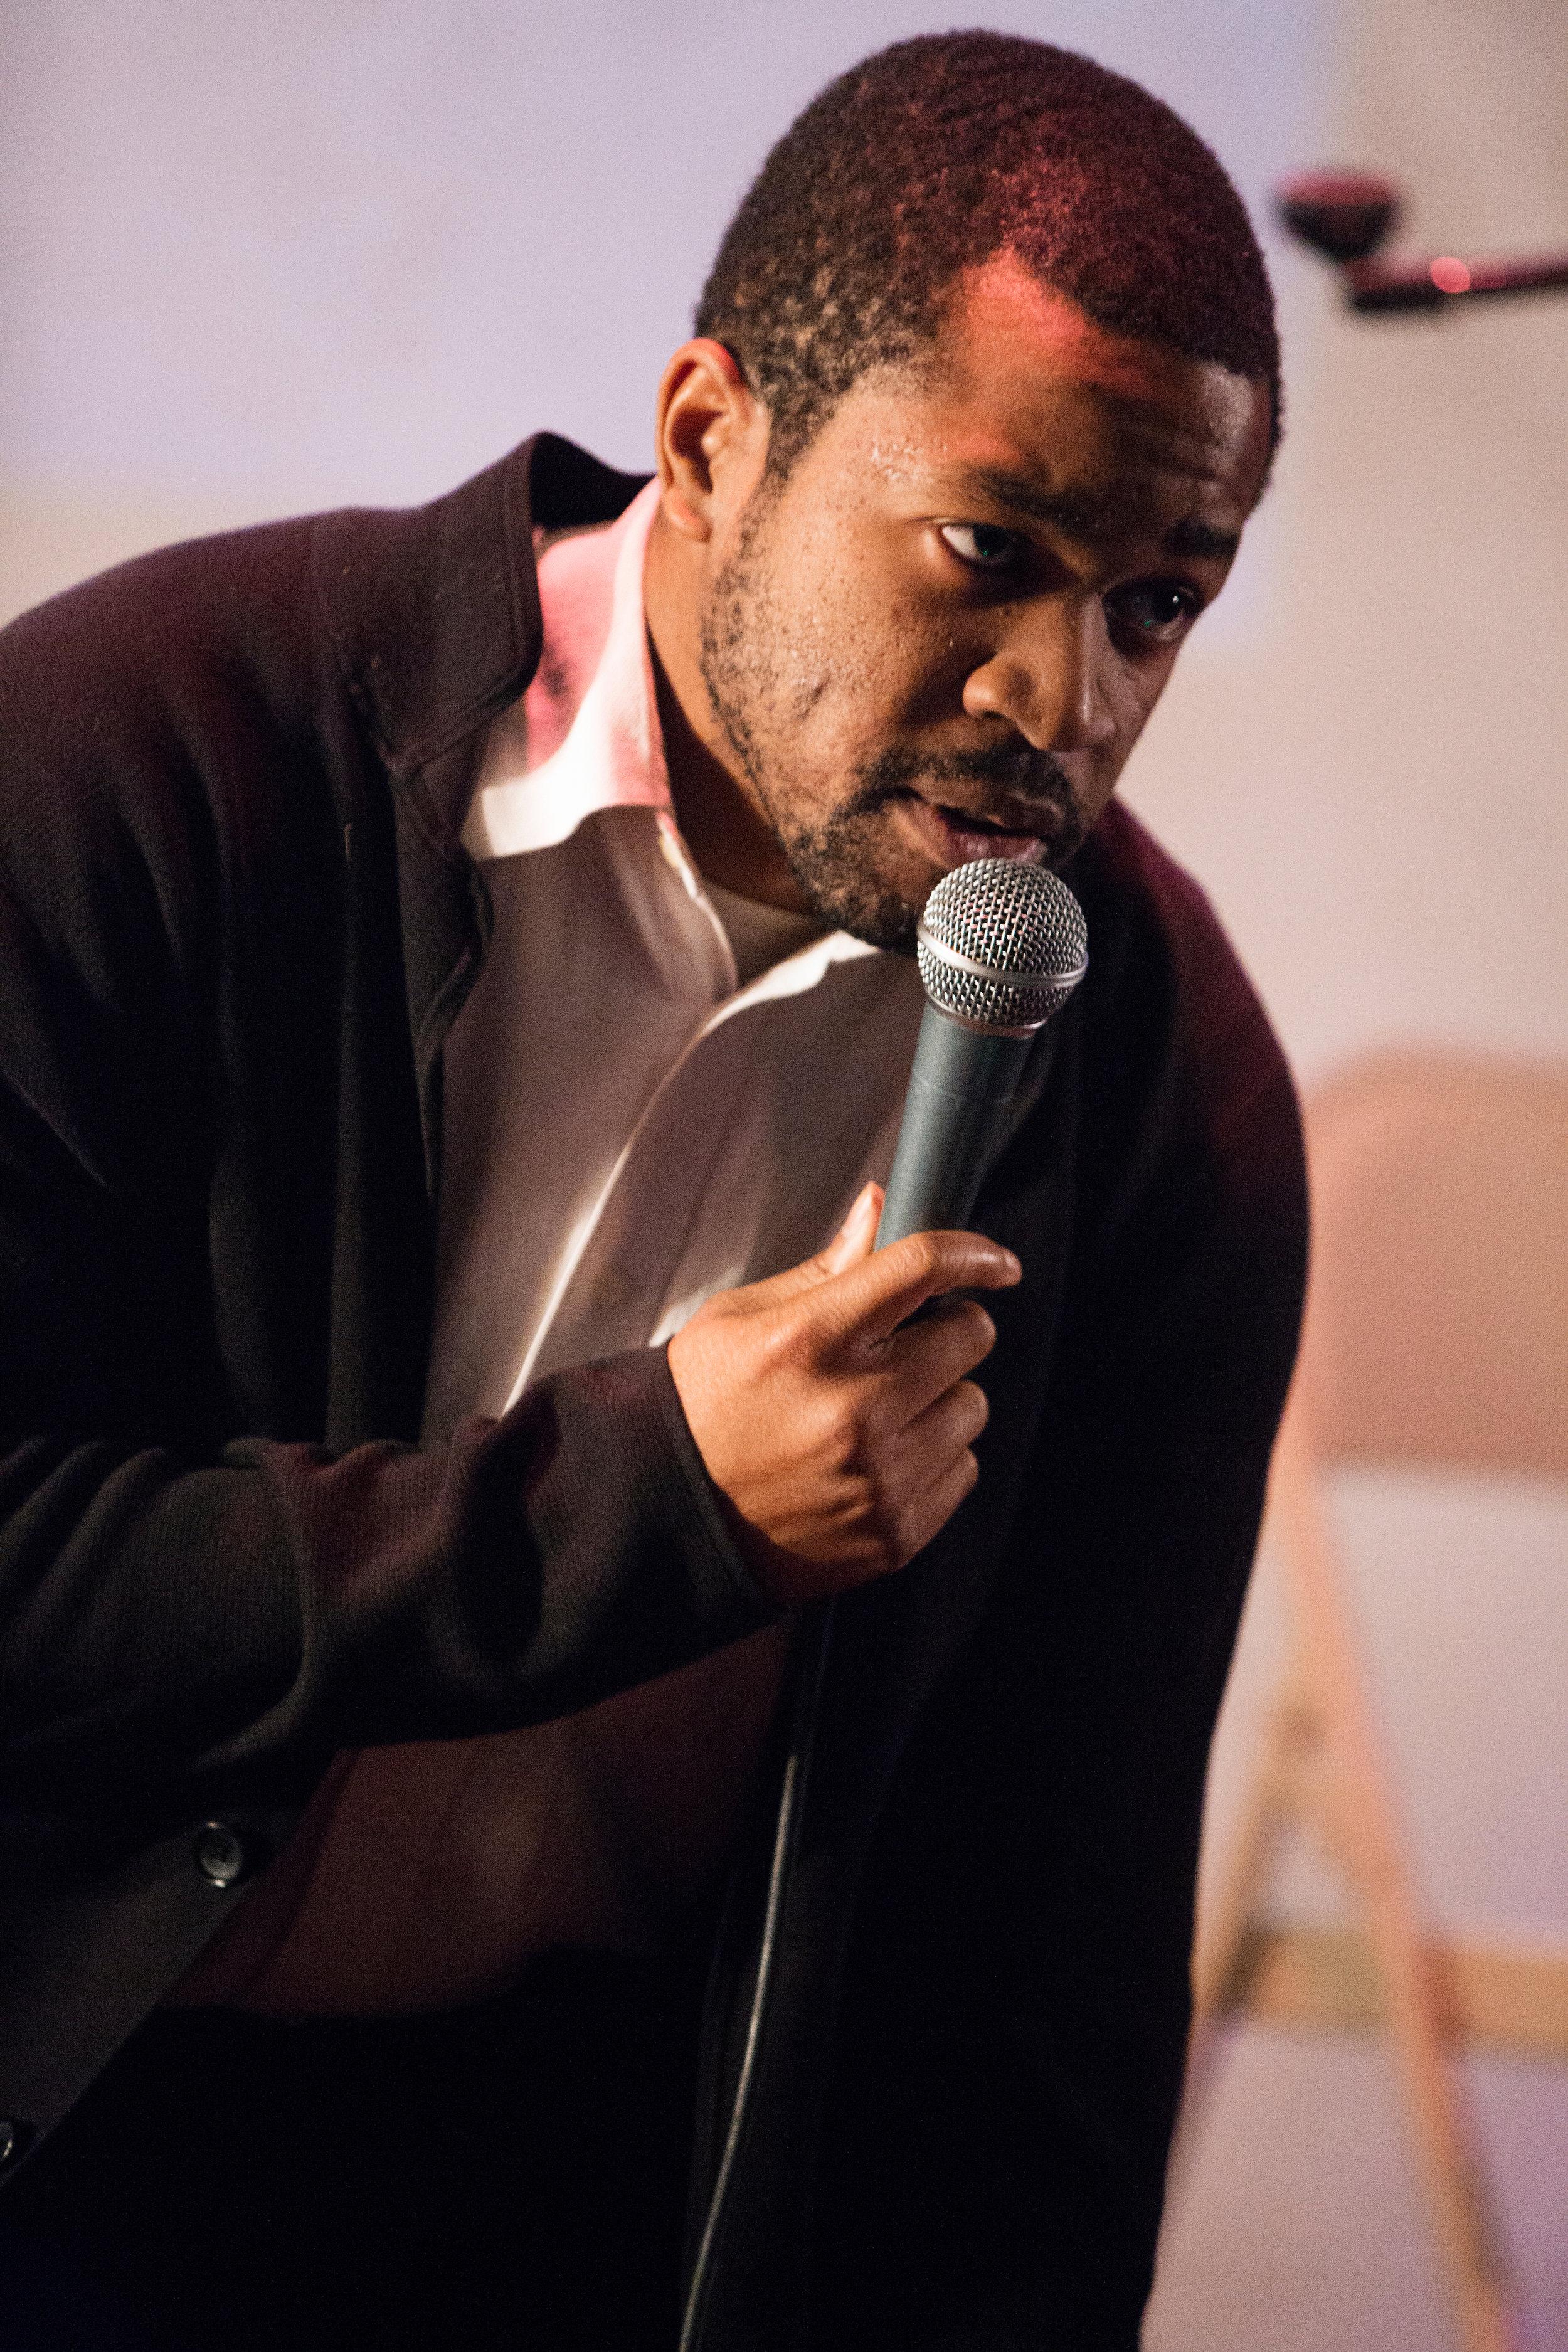 Ikechukwu Ufomadu  performing at The Macaulay Culkin Show's One-Year Anniversary Show, 12/14/14, Shea Stadium, Brooklyn, NY, Photo: Mindy Tucker